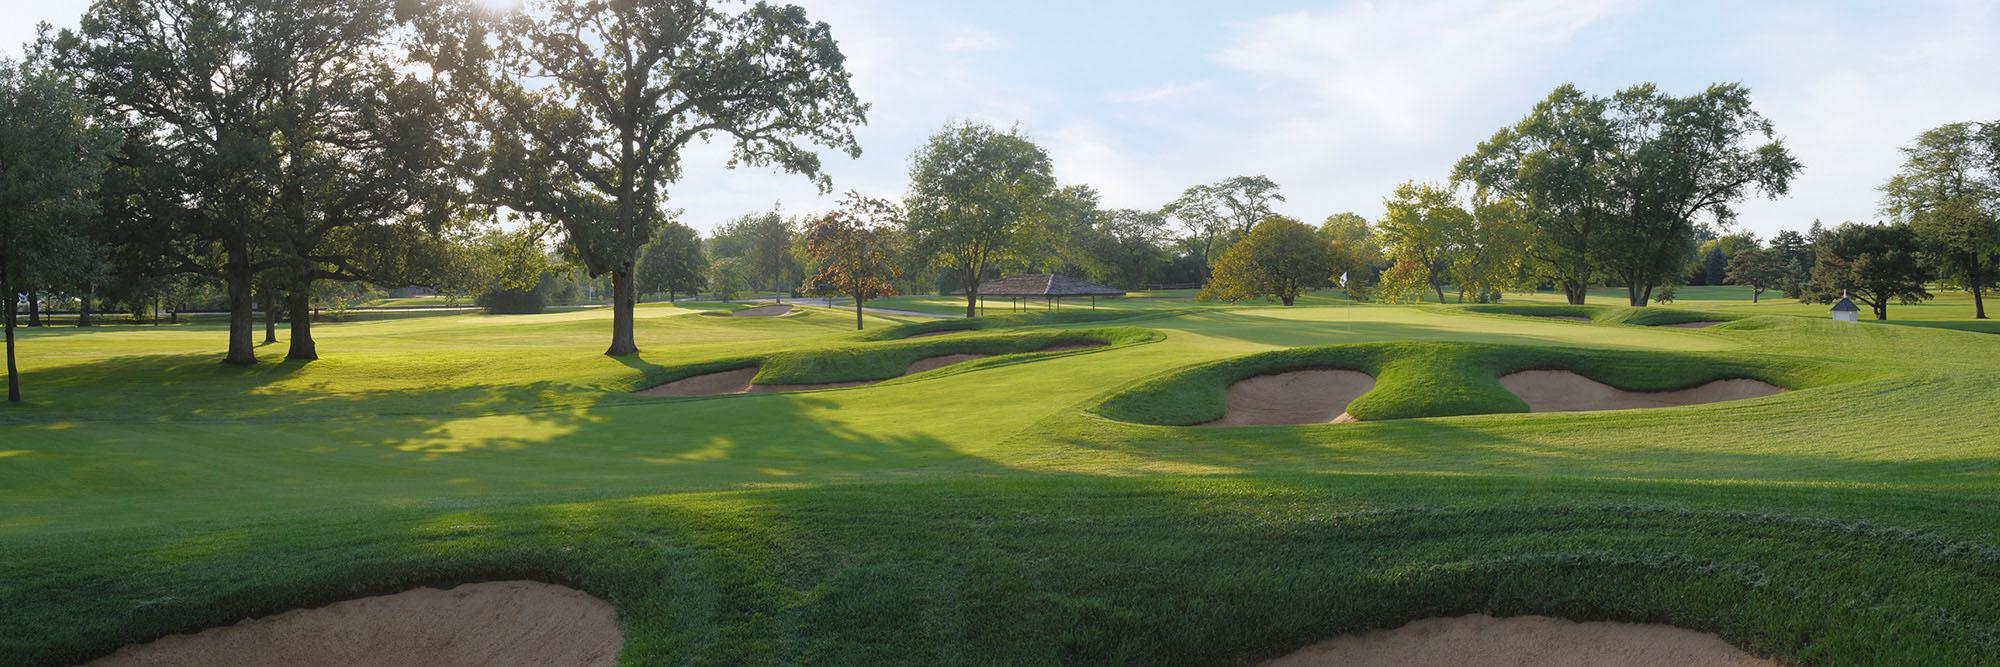 Golf Course Image - Cog Hill 4 No. 10